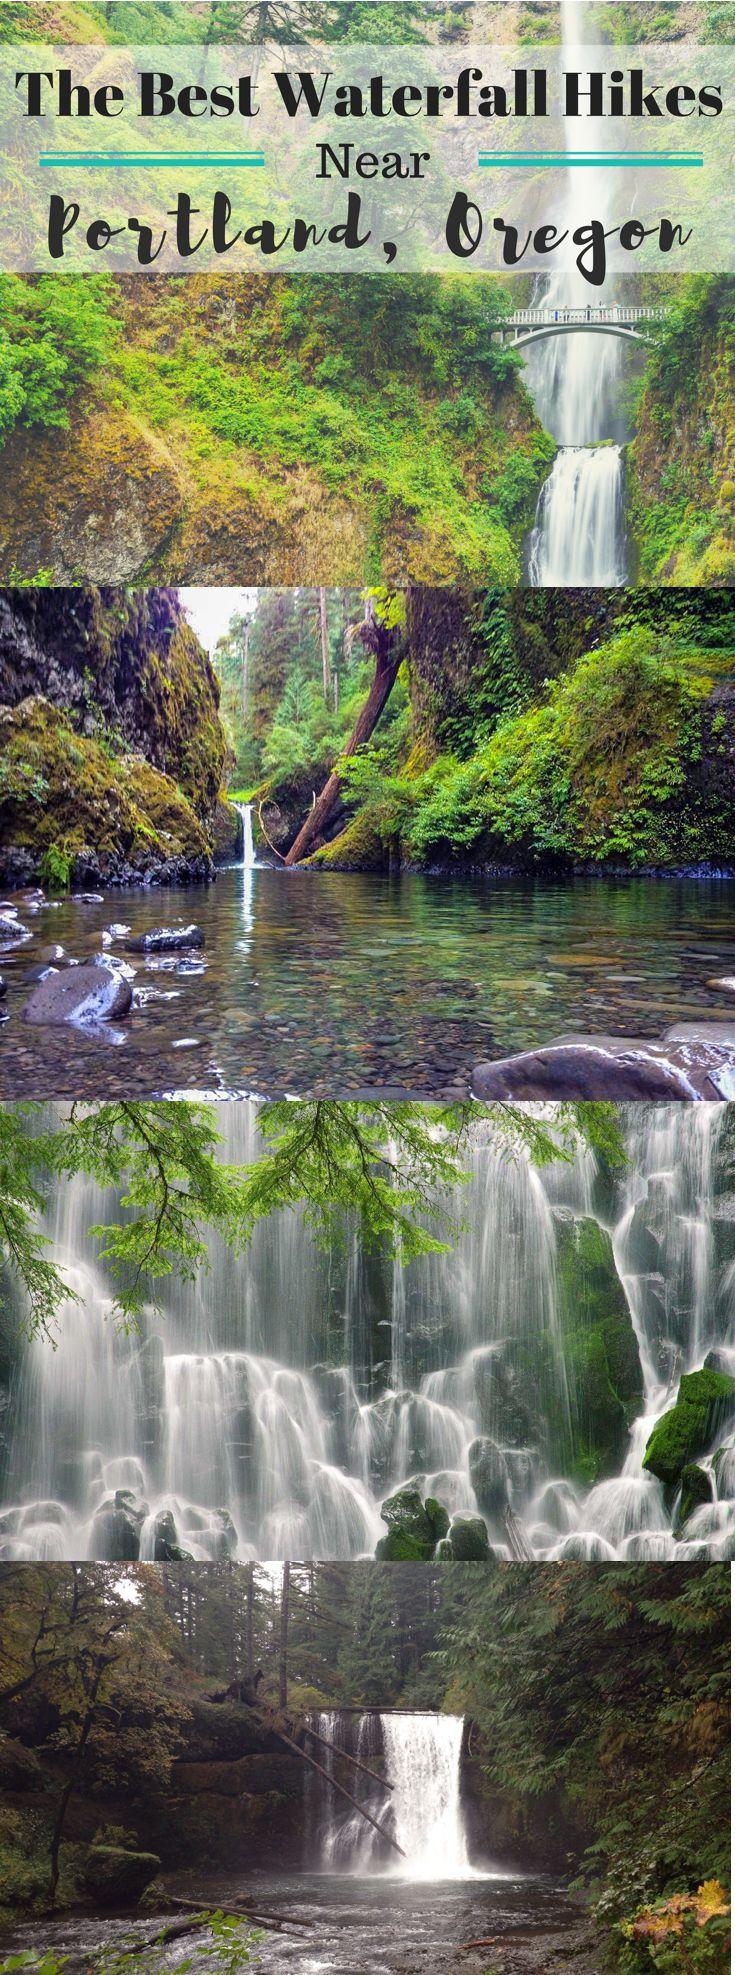 The best waterfall hikes near Portland, Oregon.